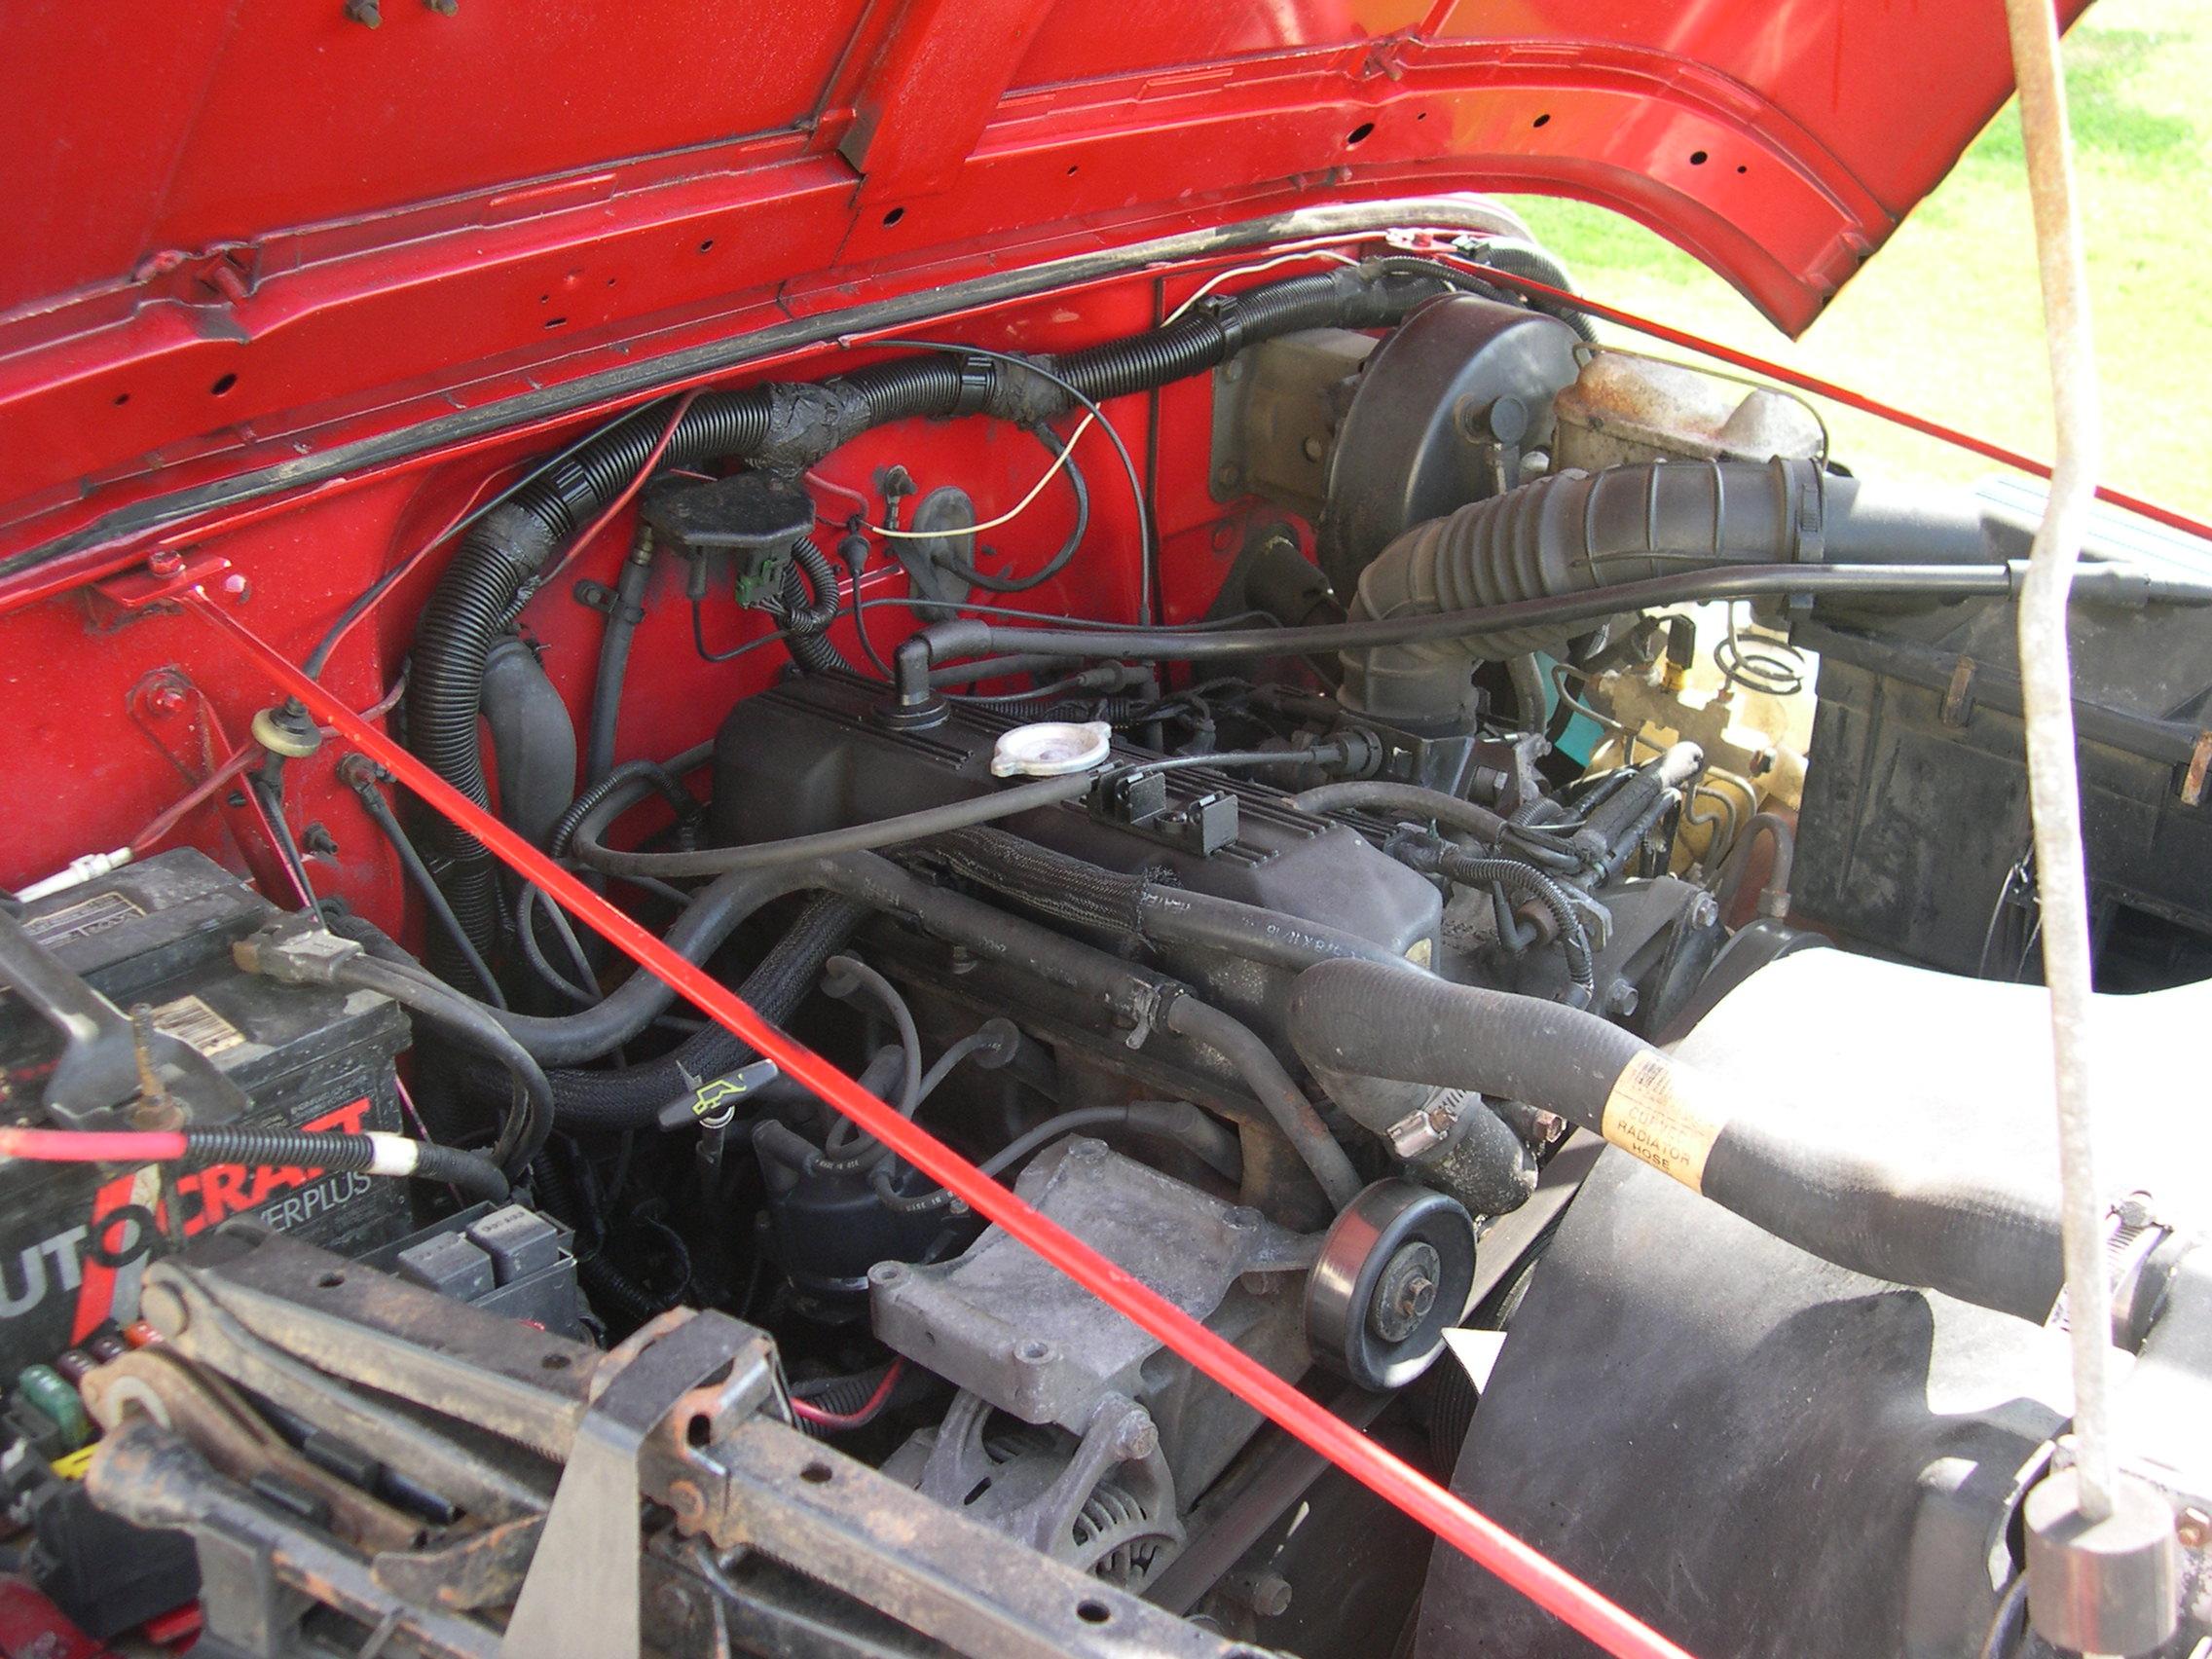 1992 chevy s10 4 3 engine diagram  1992  free engine image